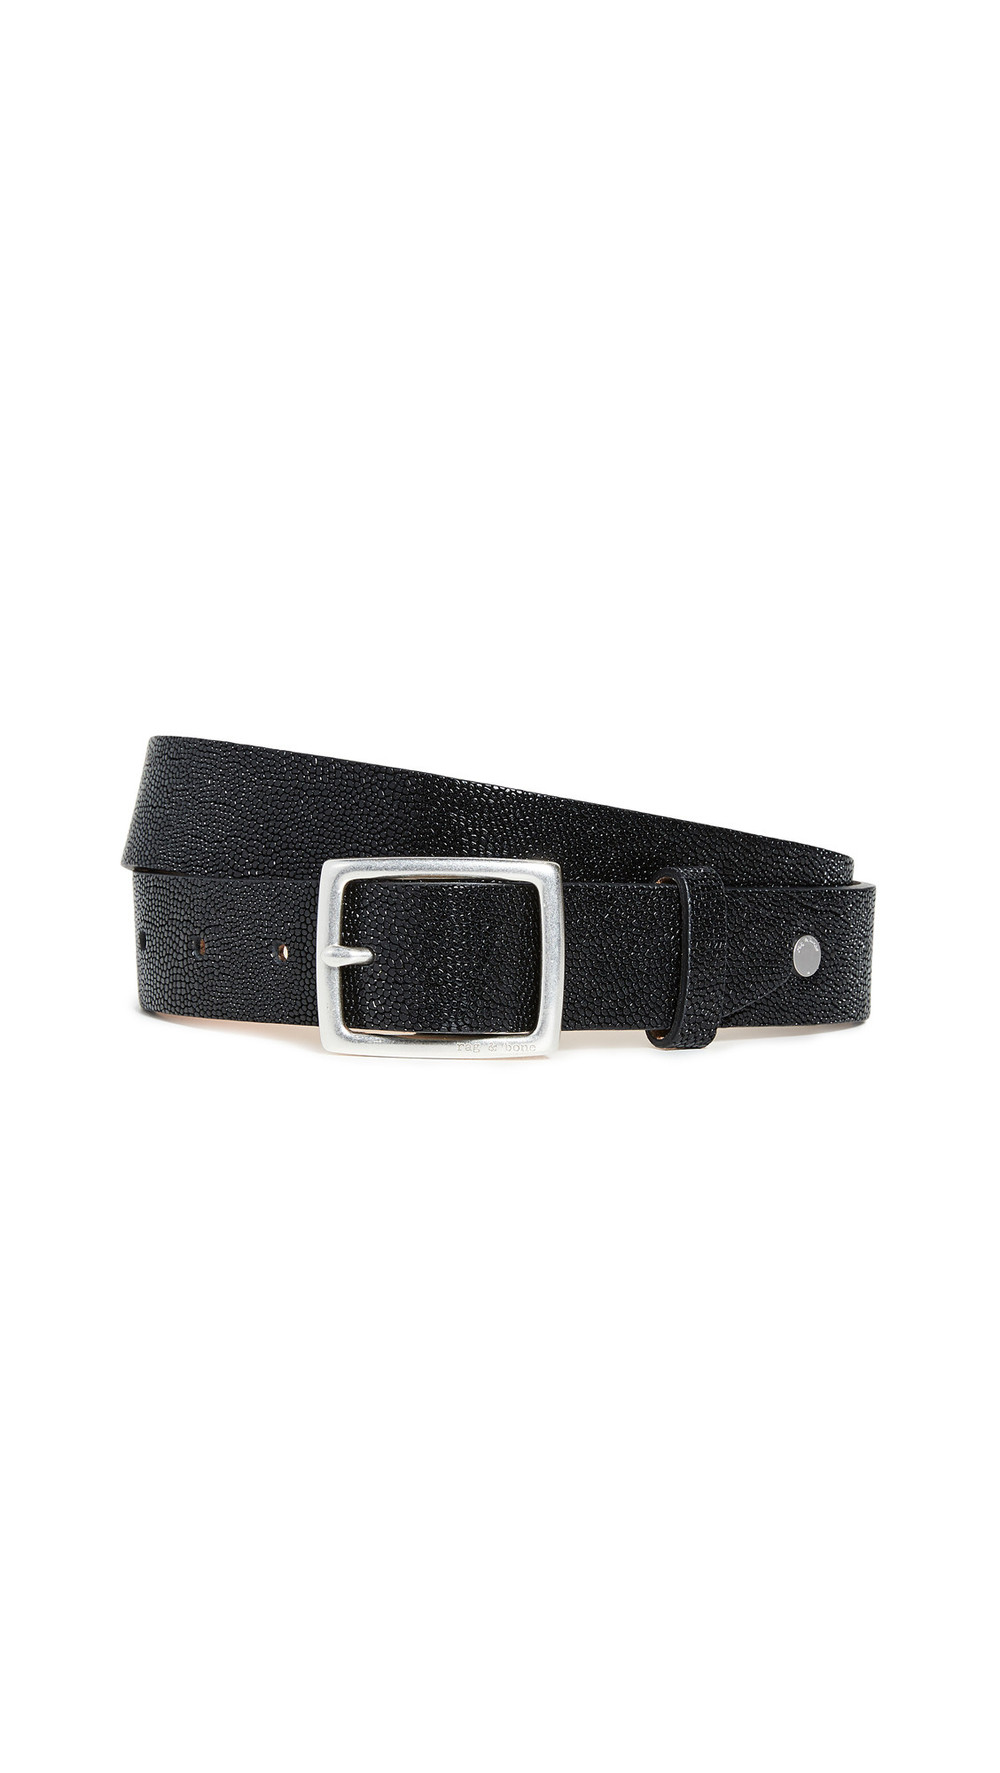 Rag & Bone Boyfriend Belt in black